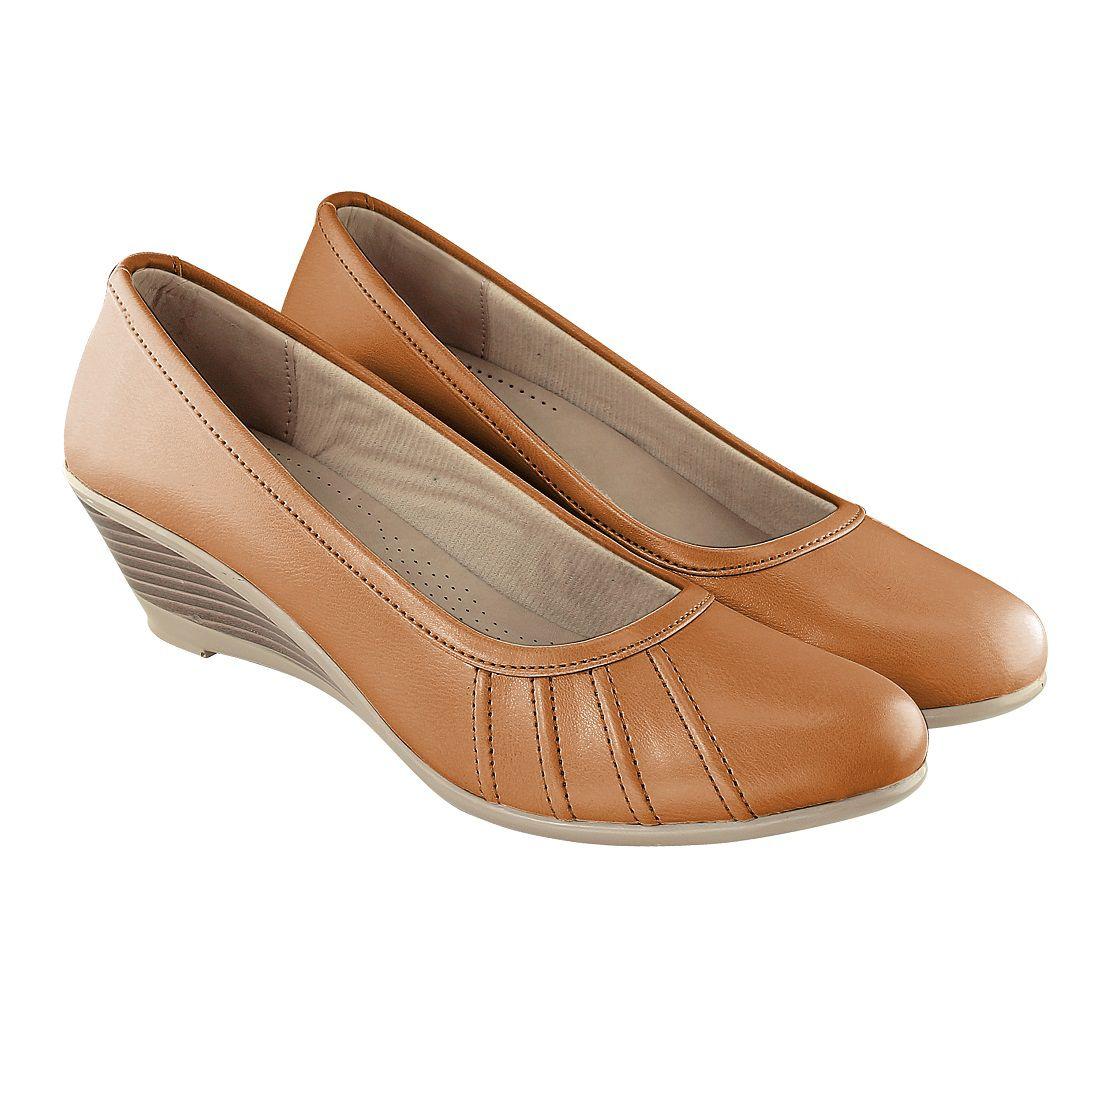 Rimson Tan Wedges Heels